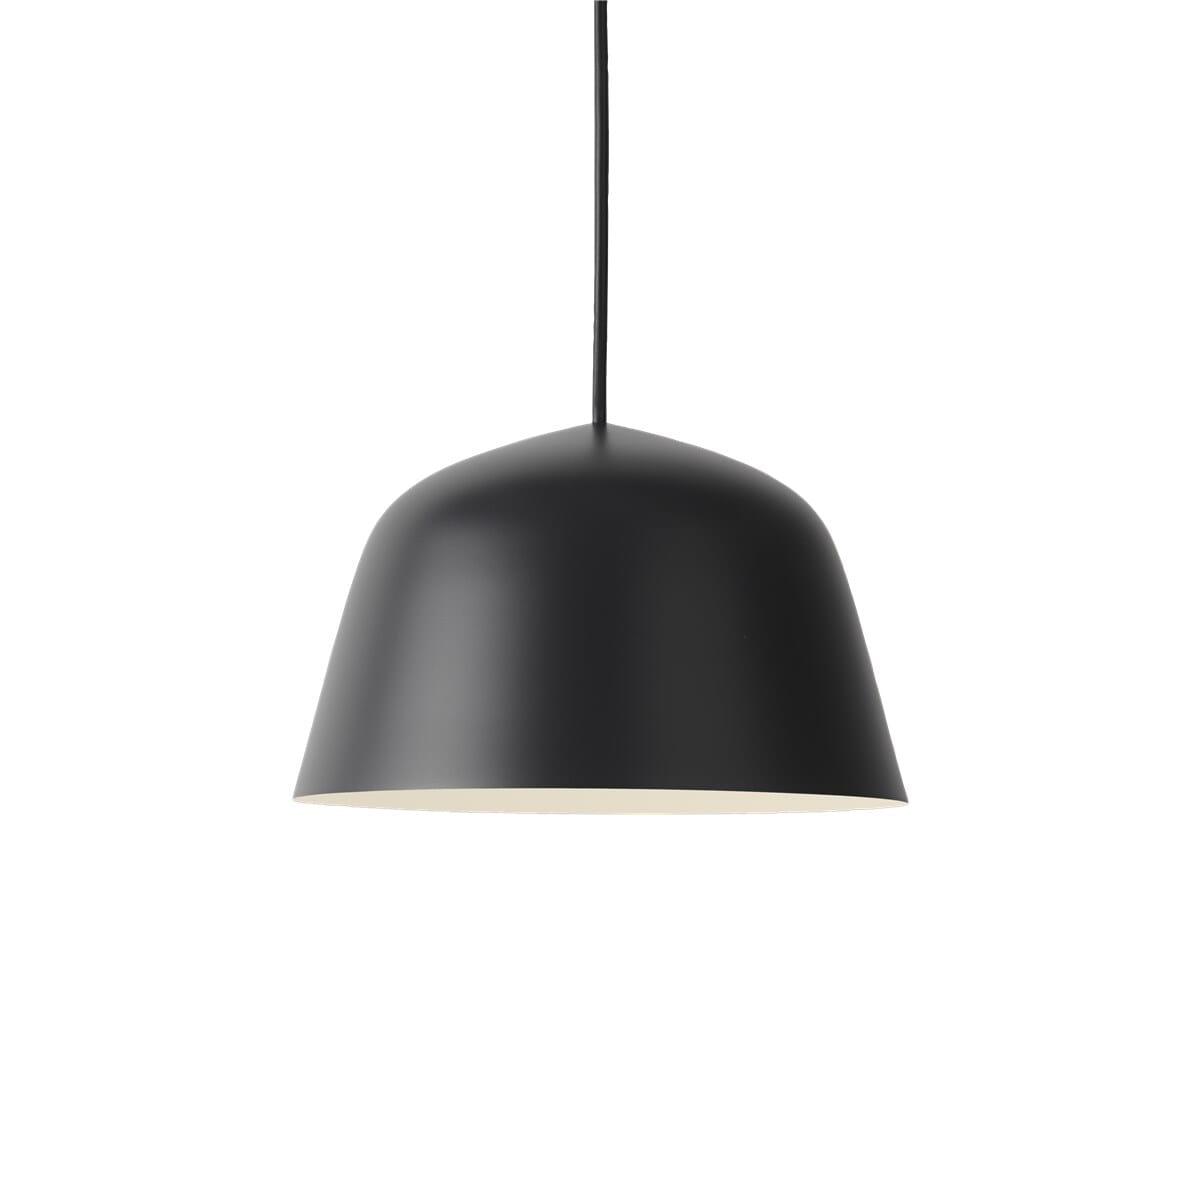 Muuto Ambit Lampe Black - Lunehjem.no - interi?r p? nett